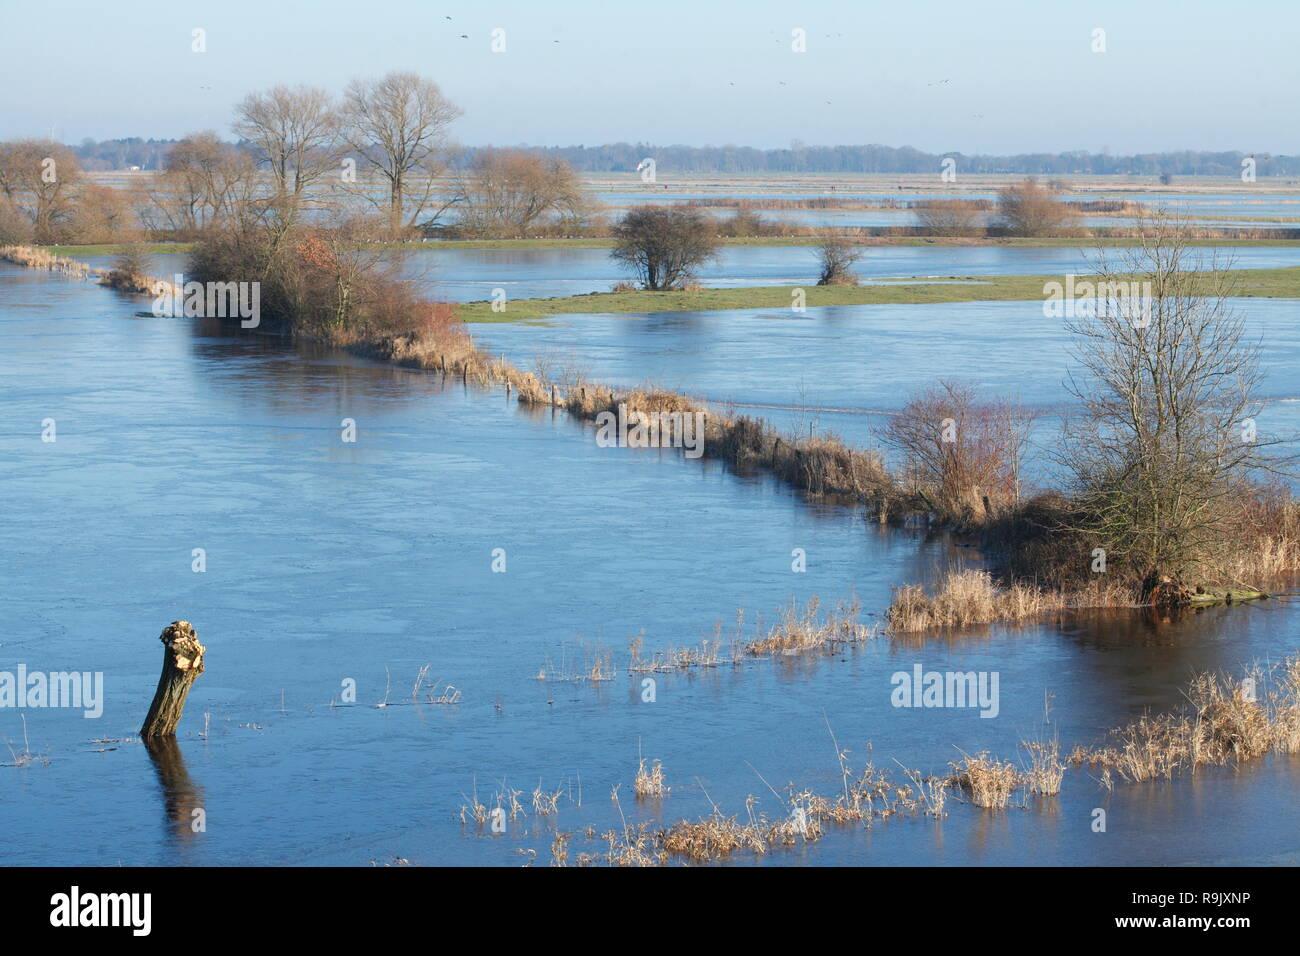 The flooded Wümmewiesen in Bremen-Borgfelld at flood, Bremen, Germany, Europe I Die  überfluteten Wümmewiesen in Bremen-Borgfelld bei Hochwasser, Brem - Stock Image